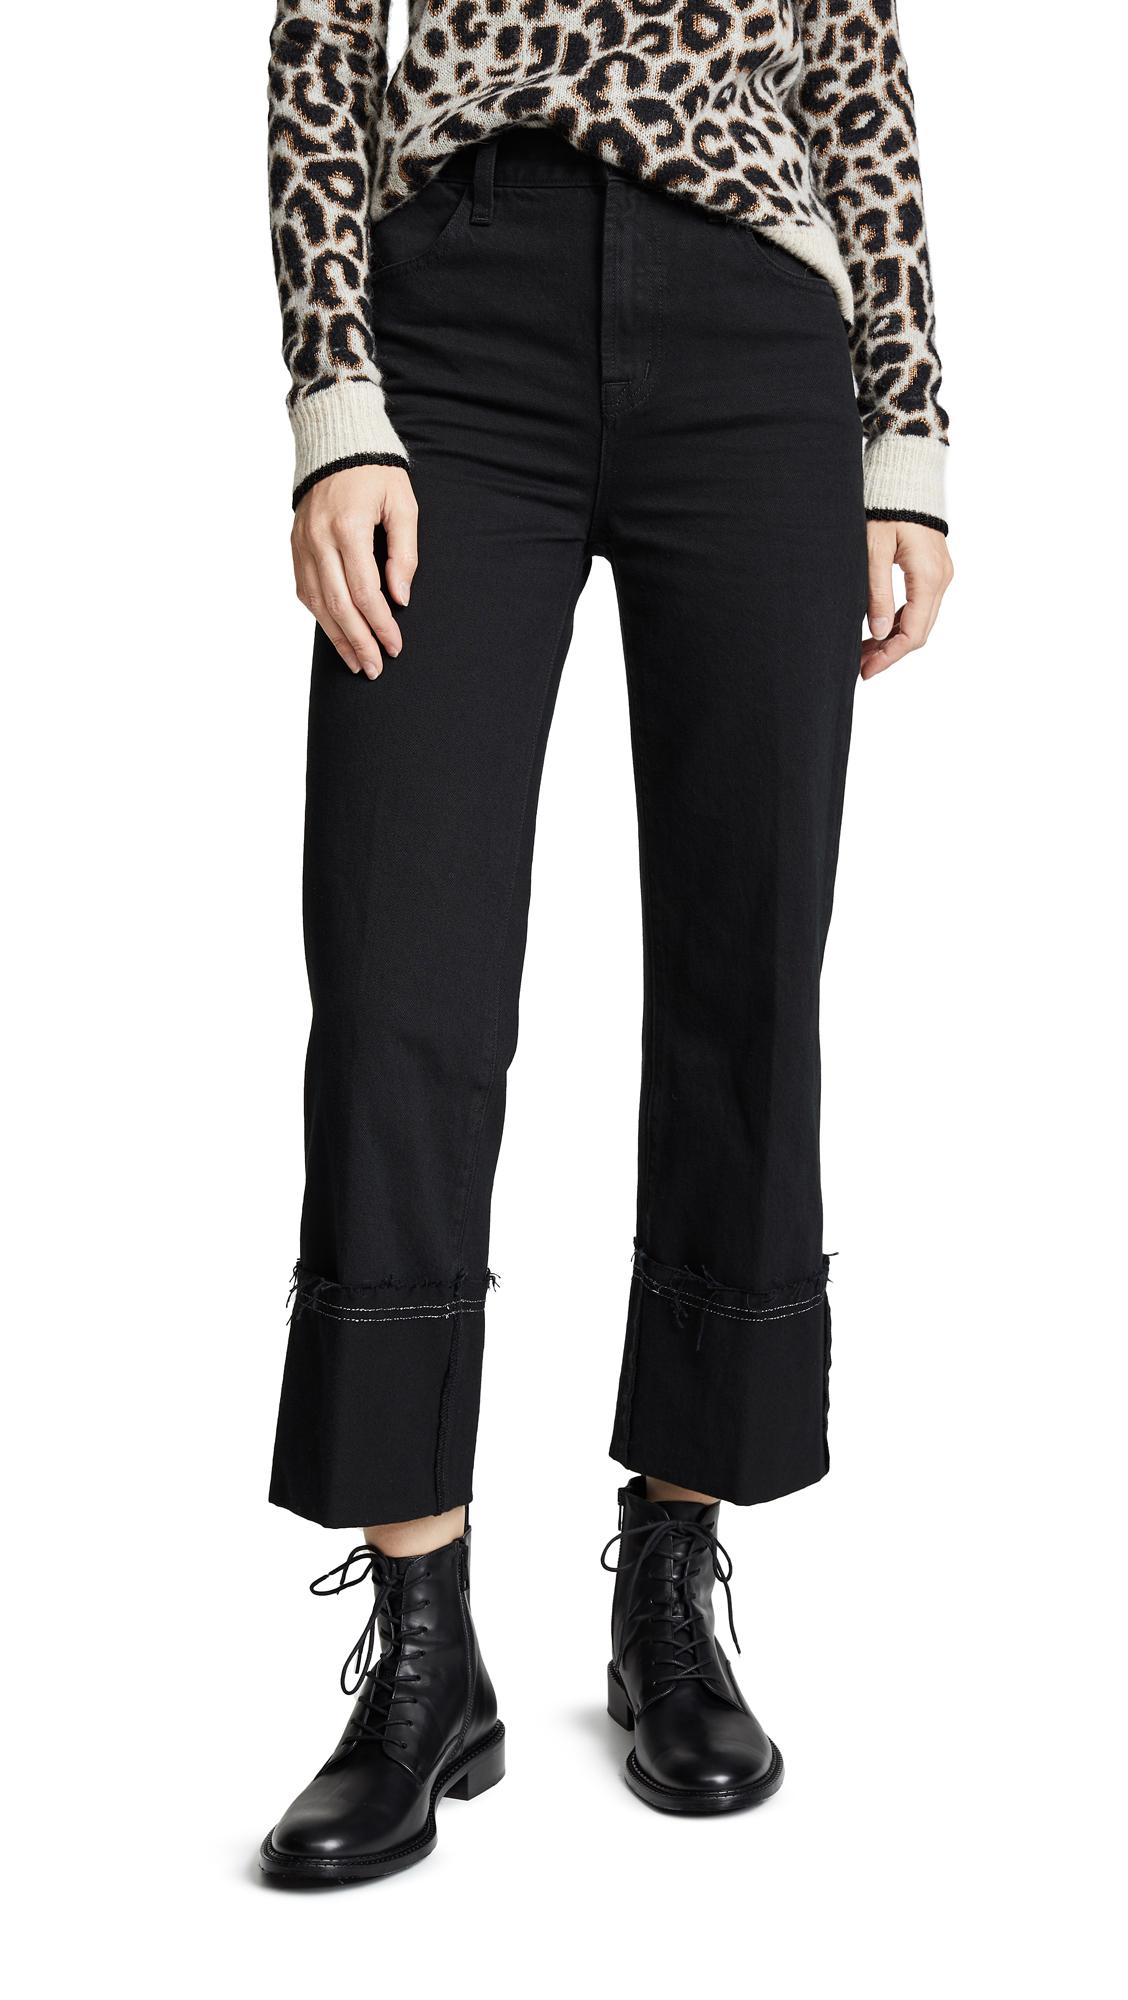 Joan Cuffed High Waist Crop Flare Jeans, Hematite